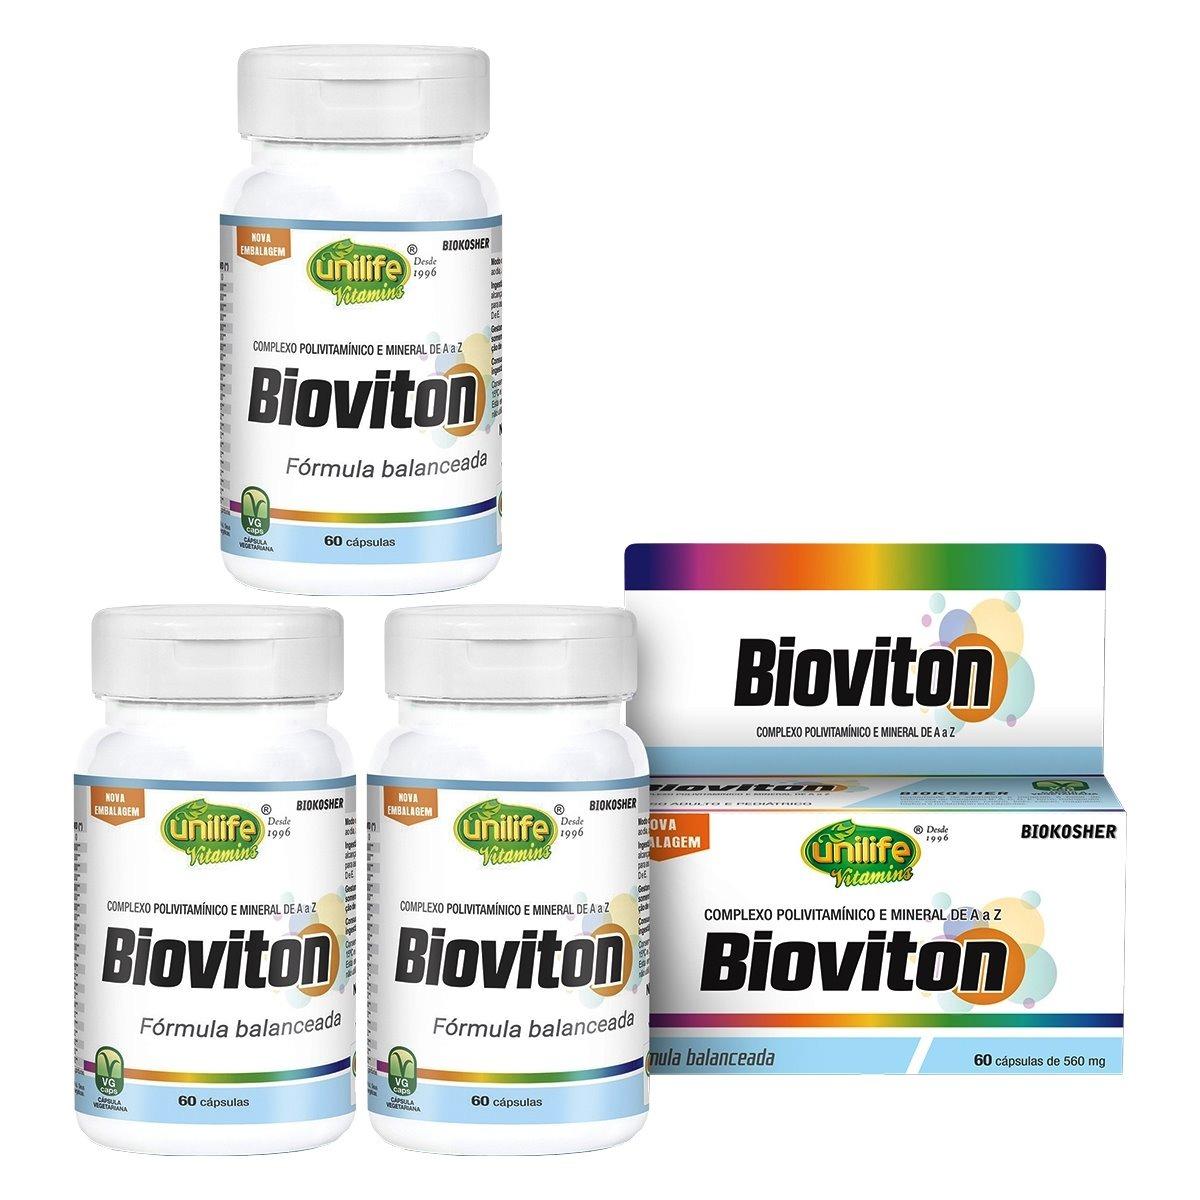 Bioviton Polivitaminico A - Z 60 Cáps 560mg Unilife Kit 3 Unidades